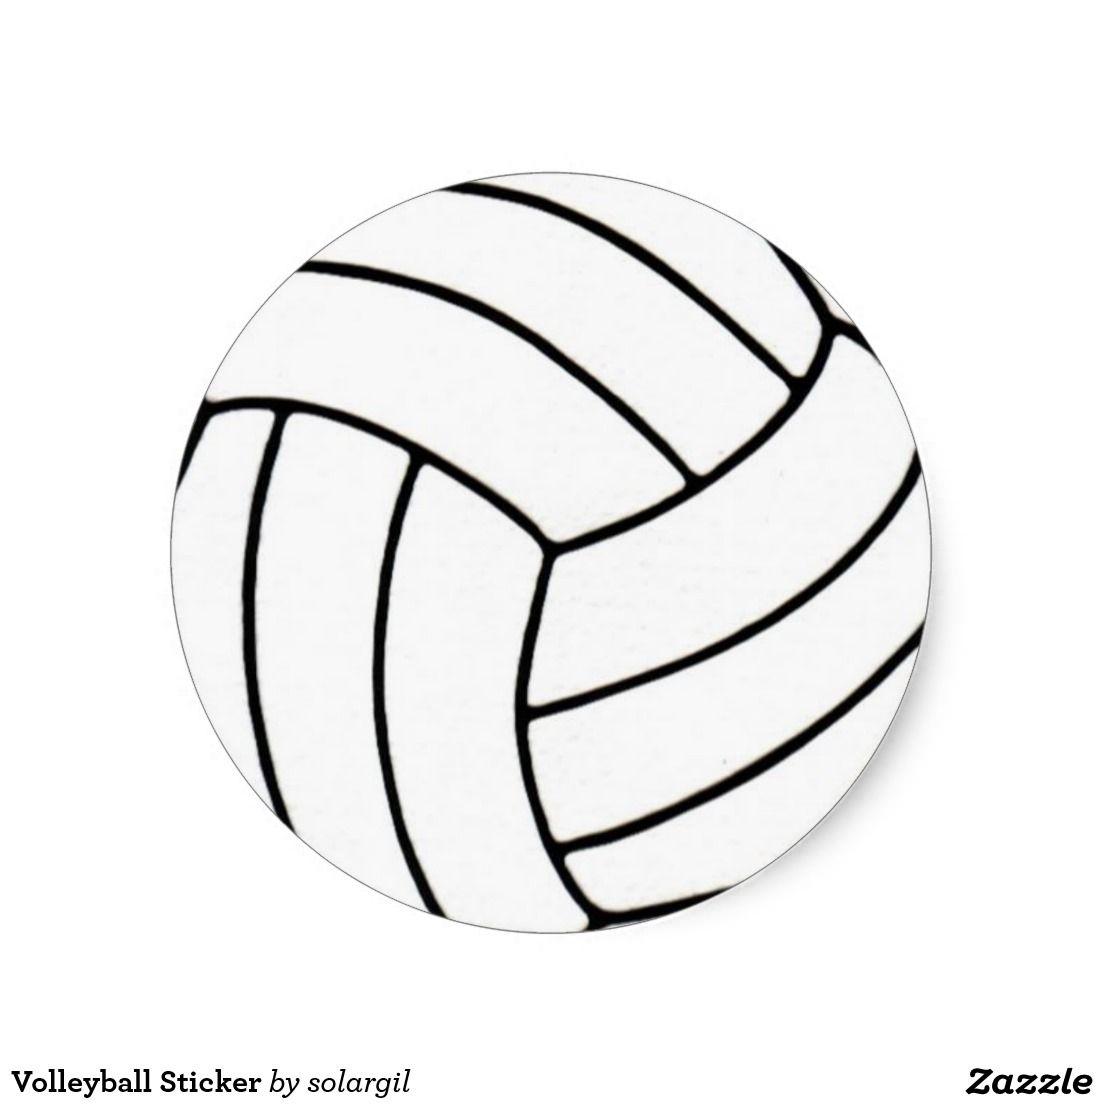 Volleyball Sticker Zazzle Com Volleyball Volleyball Gifts Mirror Stickers